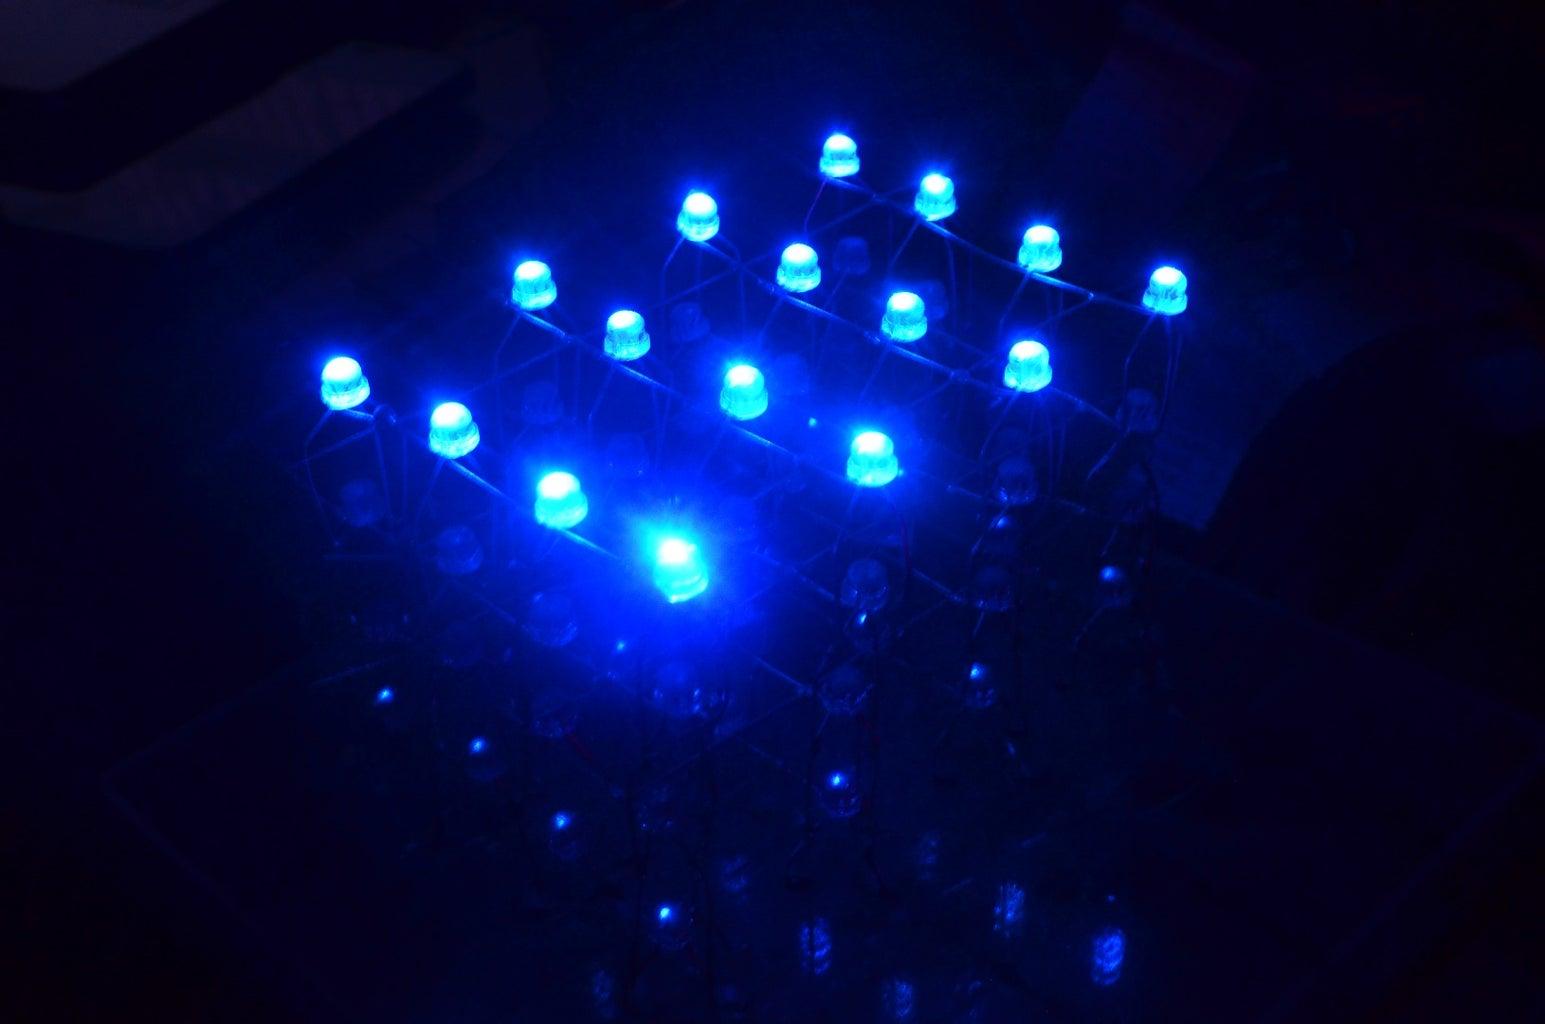 RGB 4x4x4 LED Cube